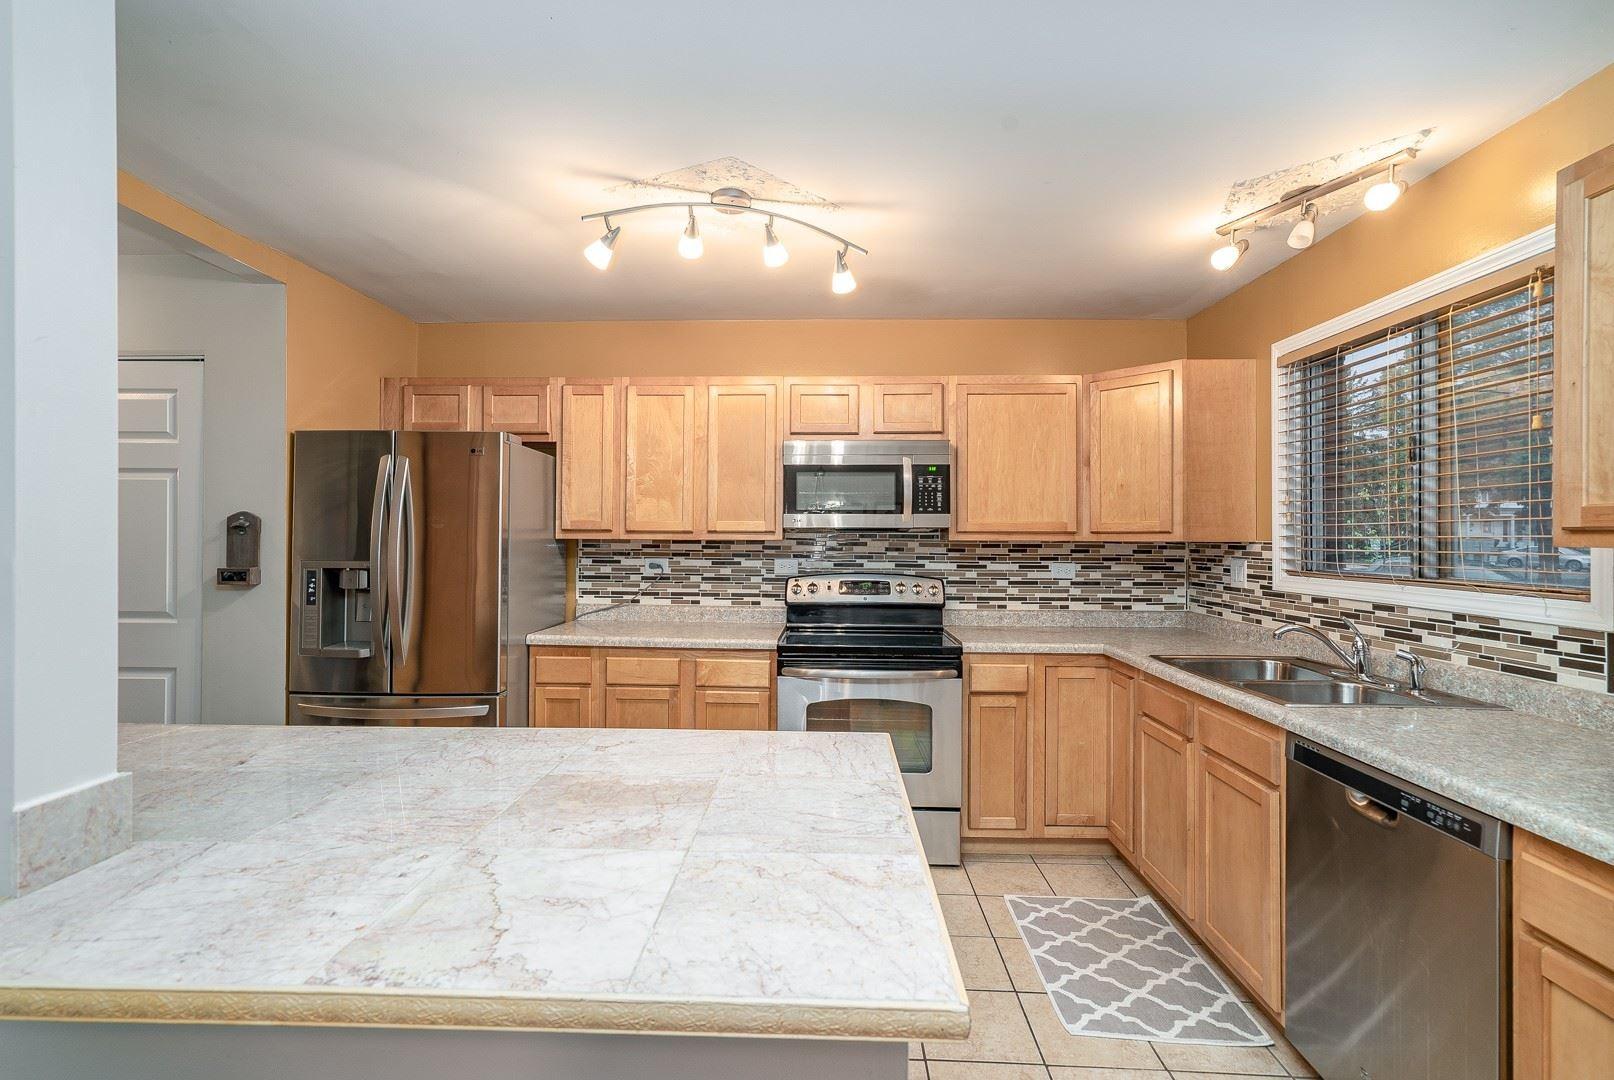 Photo of 32S Fernwood Drive #32S, Bolingbrook, IL 60440 (MLS # 10889736)